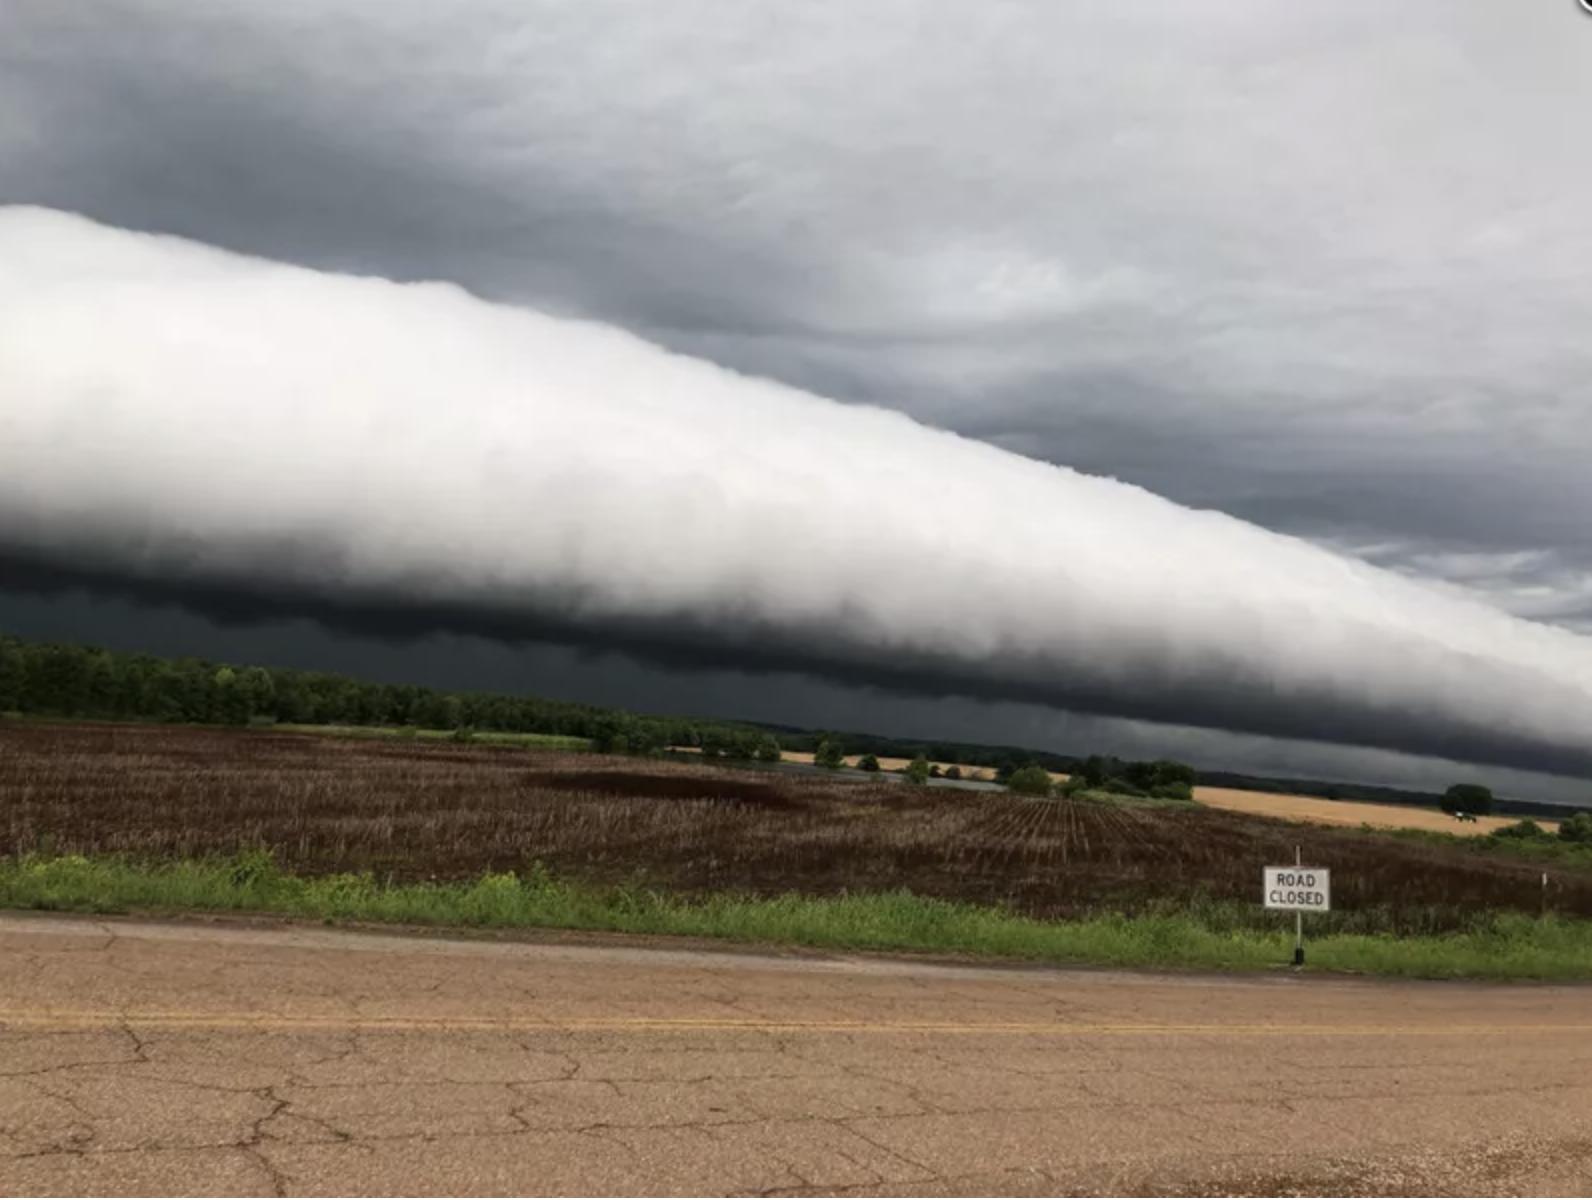 Ominous UFO-like cloud identified as rare